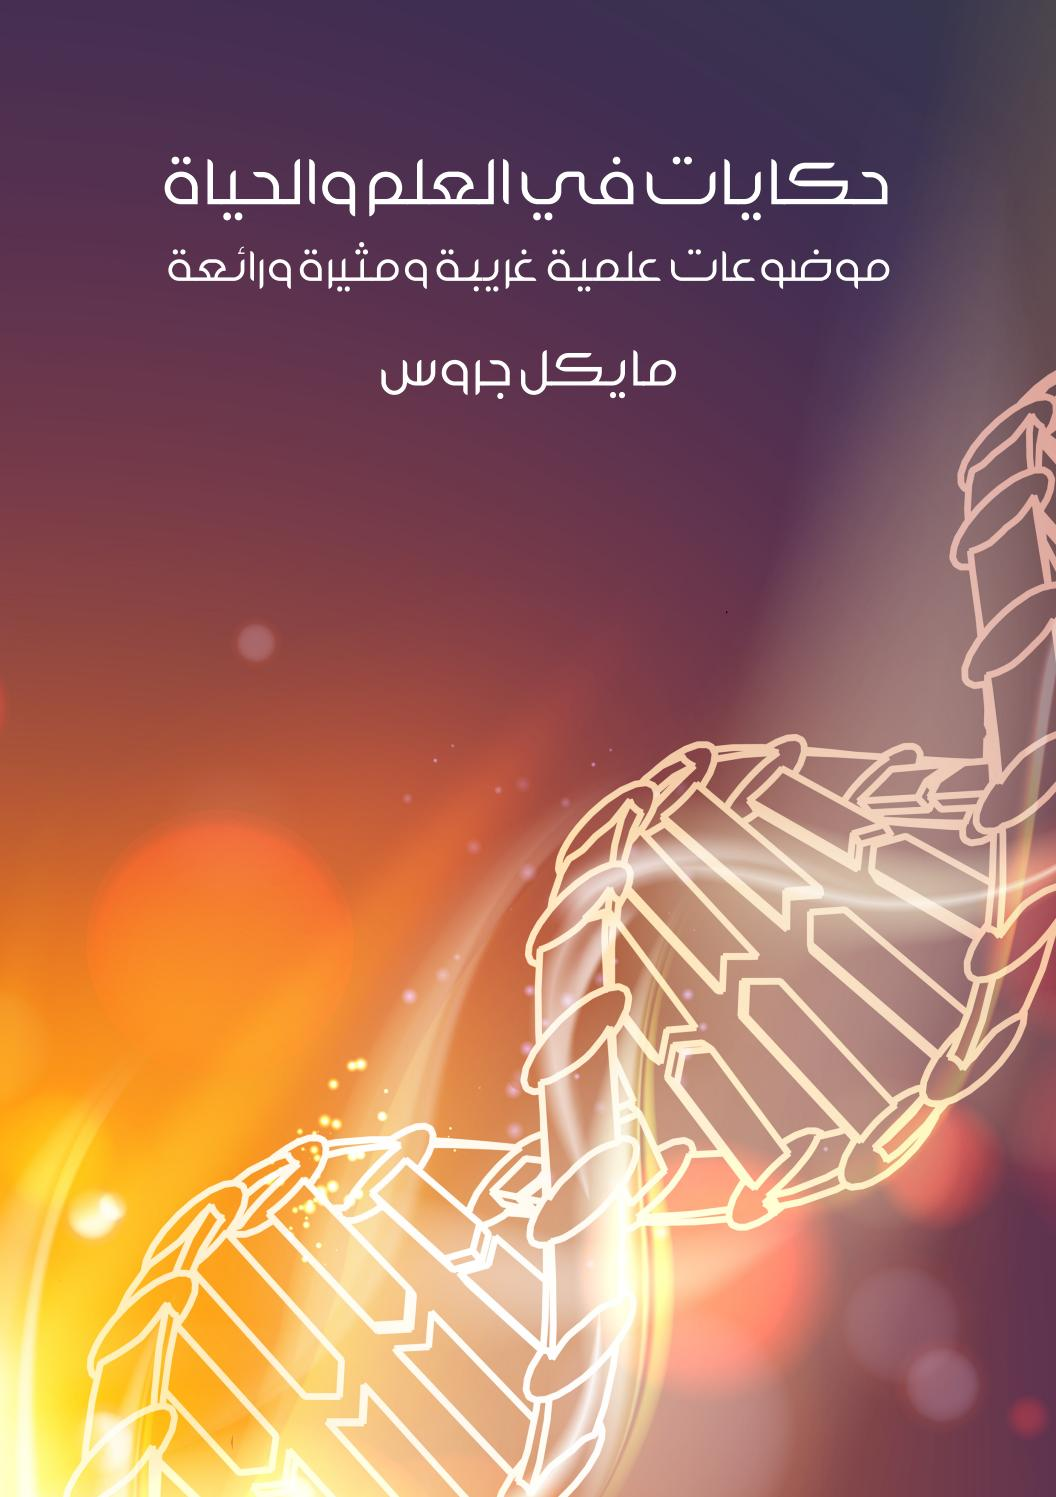 ca38f947d حكايات في العلم والحياة by Hussein Abusamra - issuu